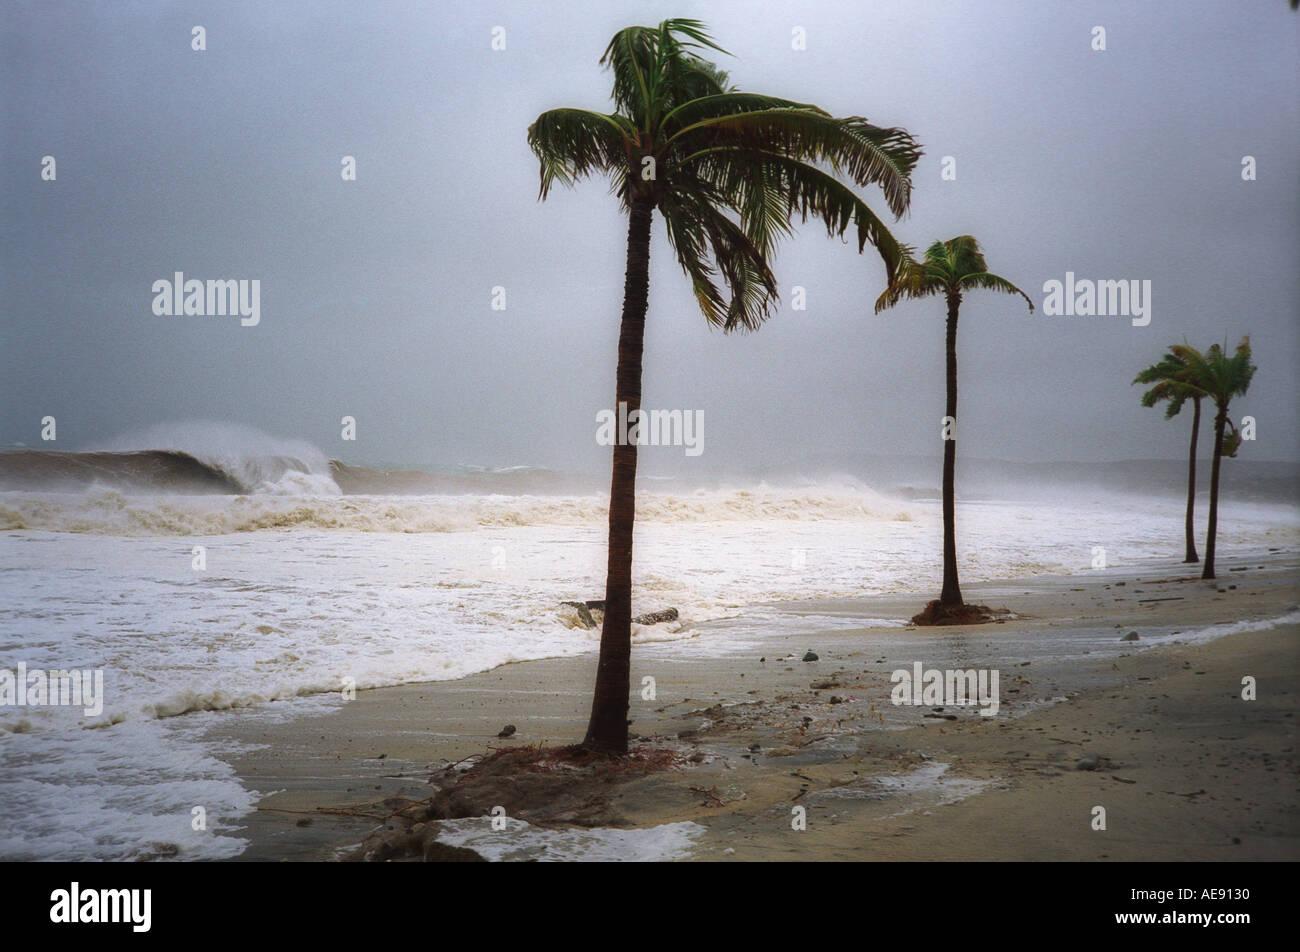 Beach during hurricane in Baja California Mexico - Stock Image